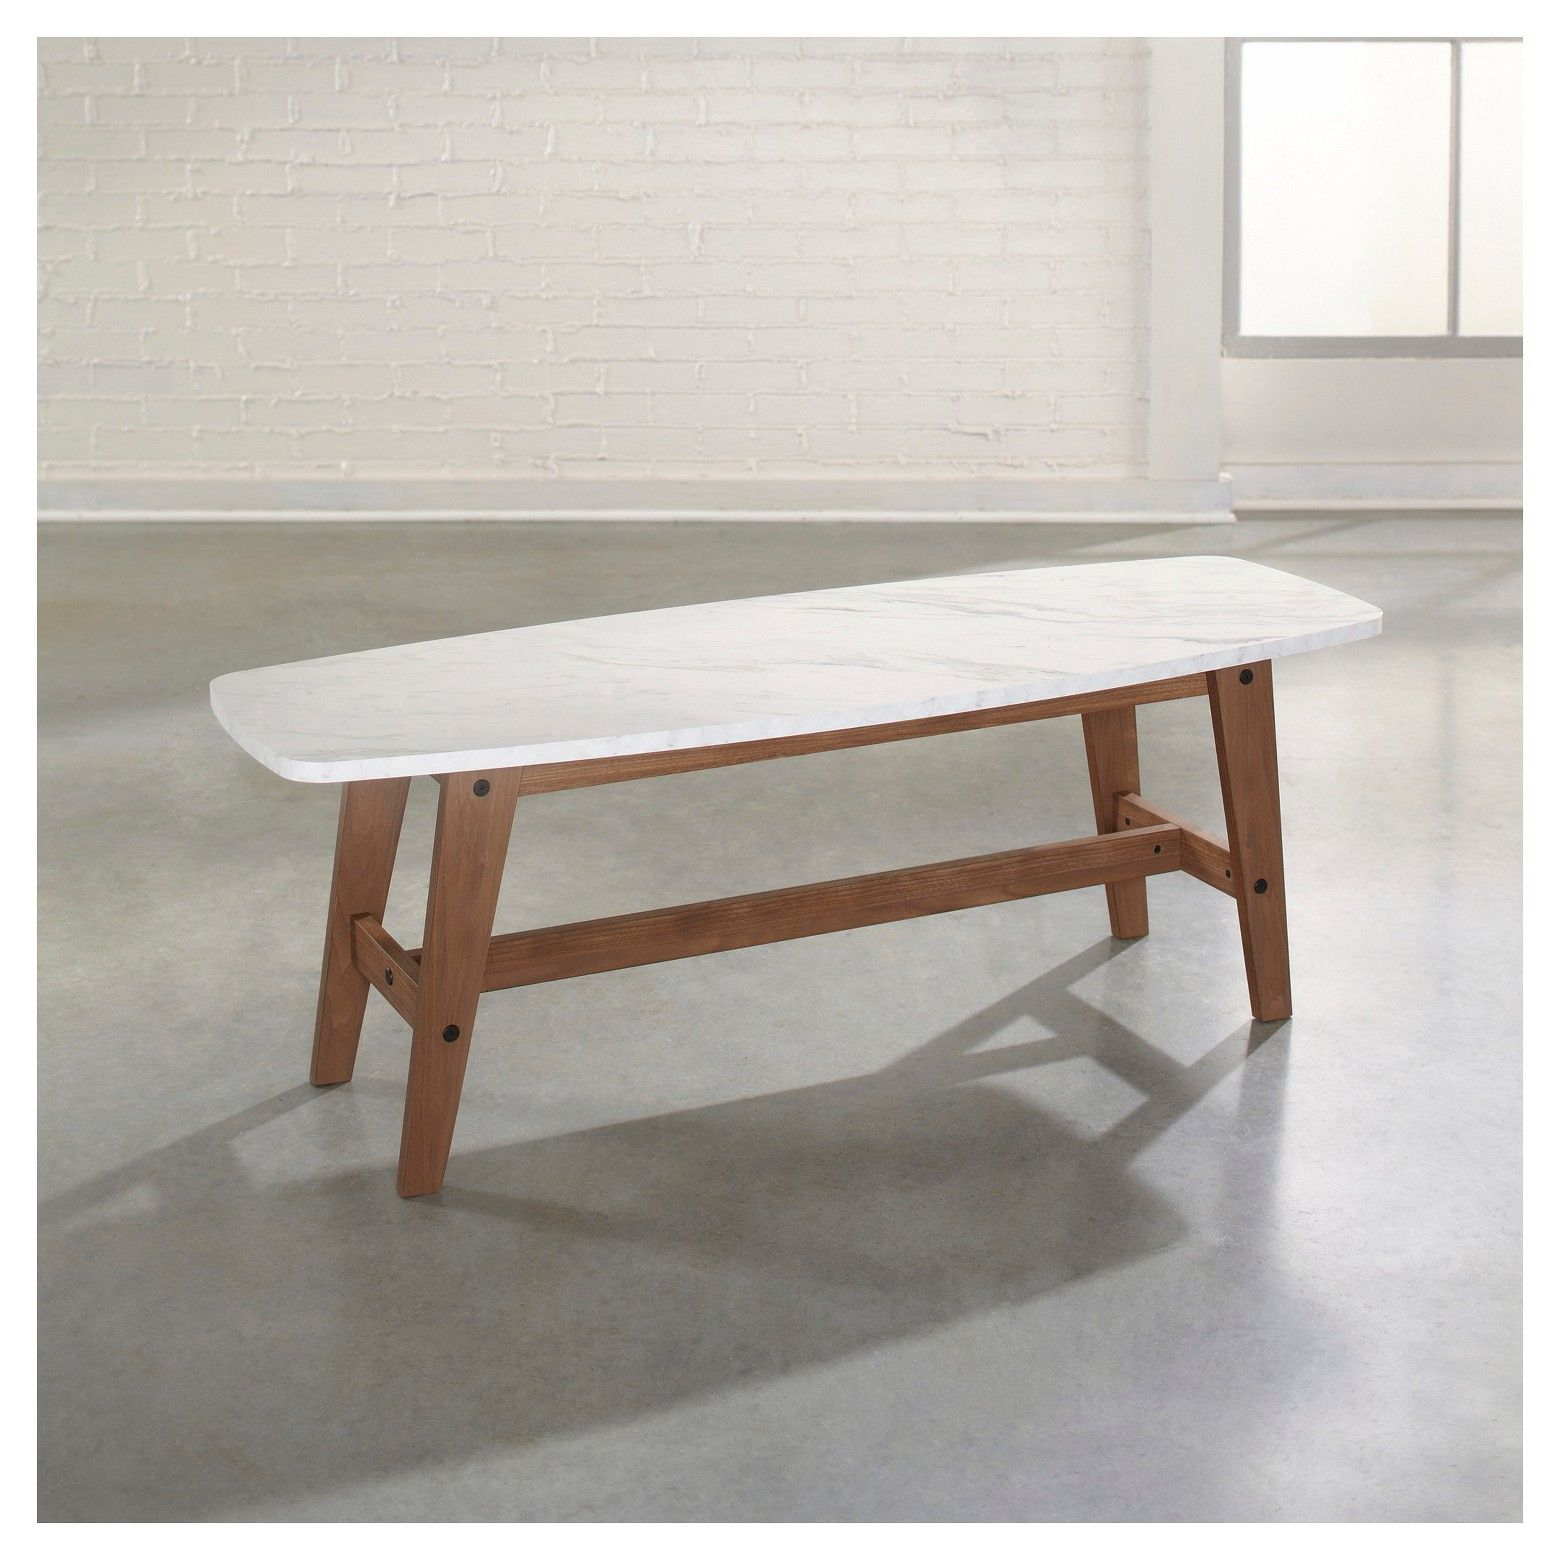 Soft Modern Coffee Table Fine Walnut Sauder Faux Marble Coffee Table Coffee Table Marble Coffee Table [ 1560 x 1560 Pixel ]